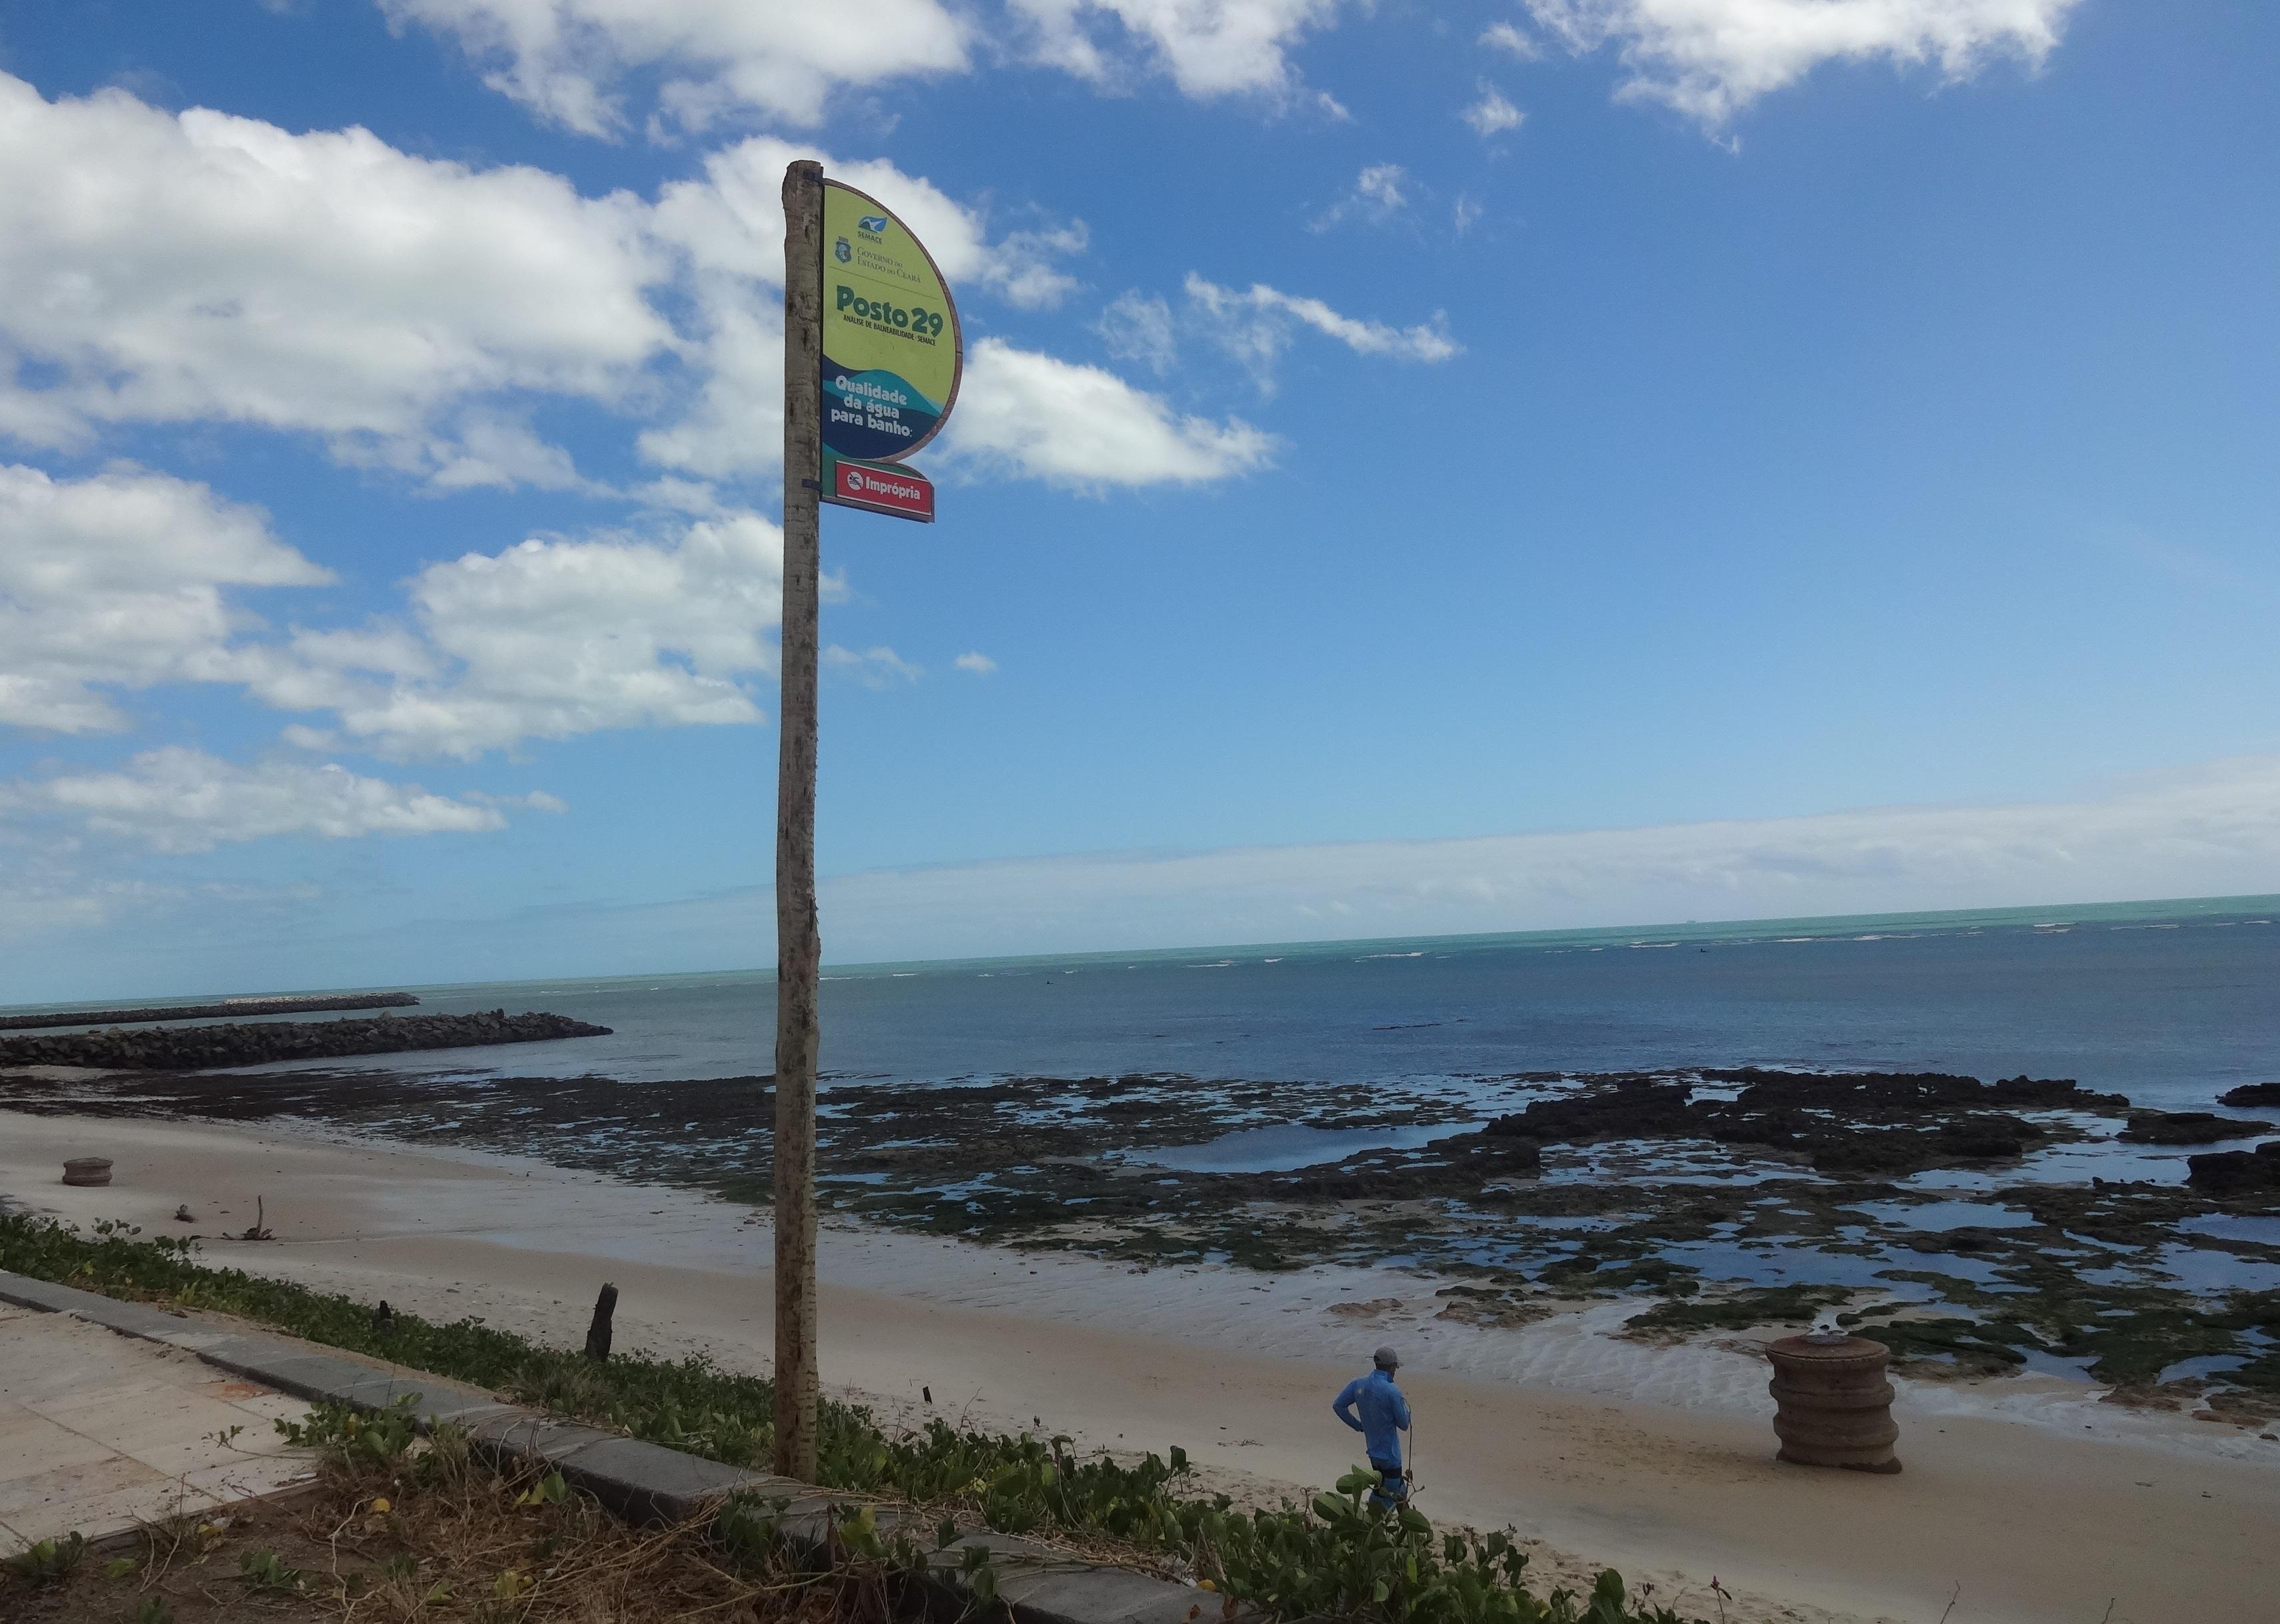 Vistoria de balneabilidade das praias do litoral oeste de Fortaleza